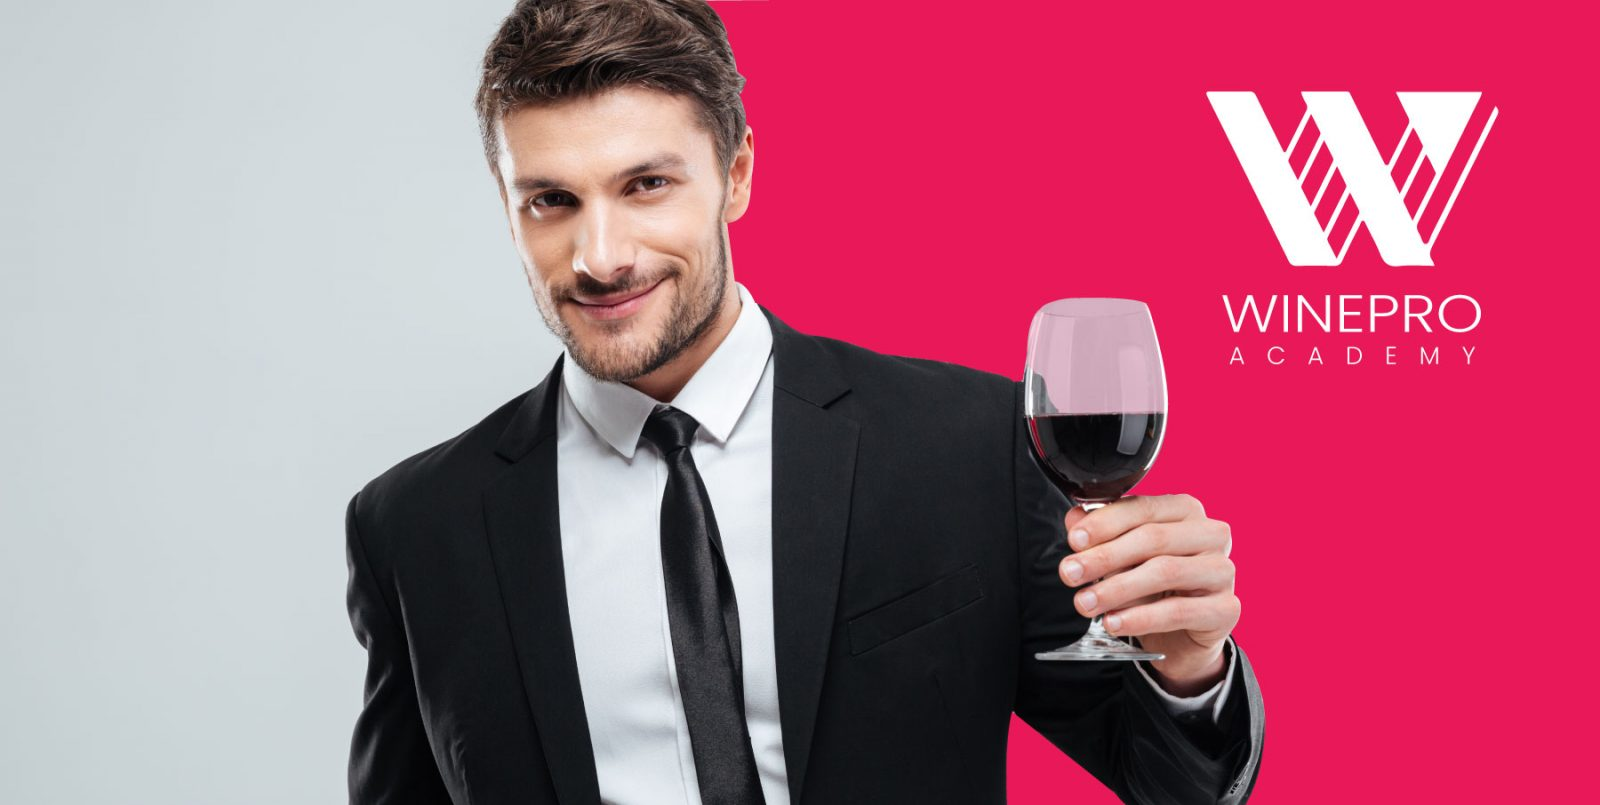 Export manager di vini cercasi: i corsi online per diventarlo